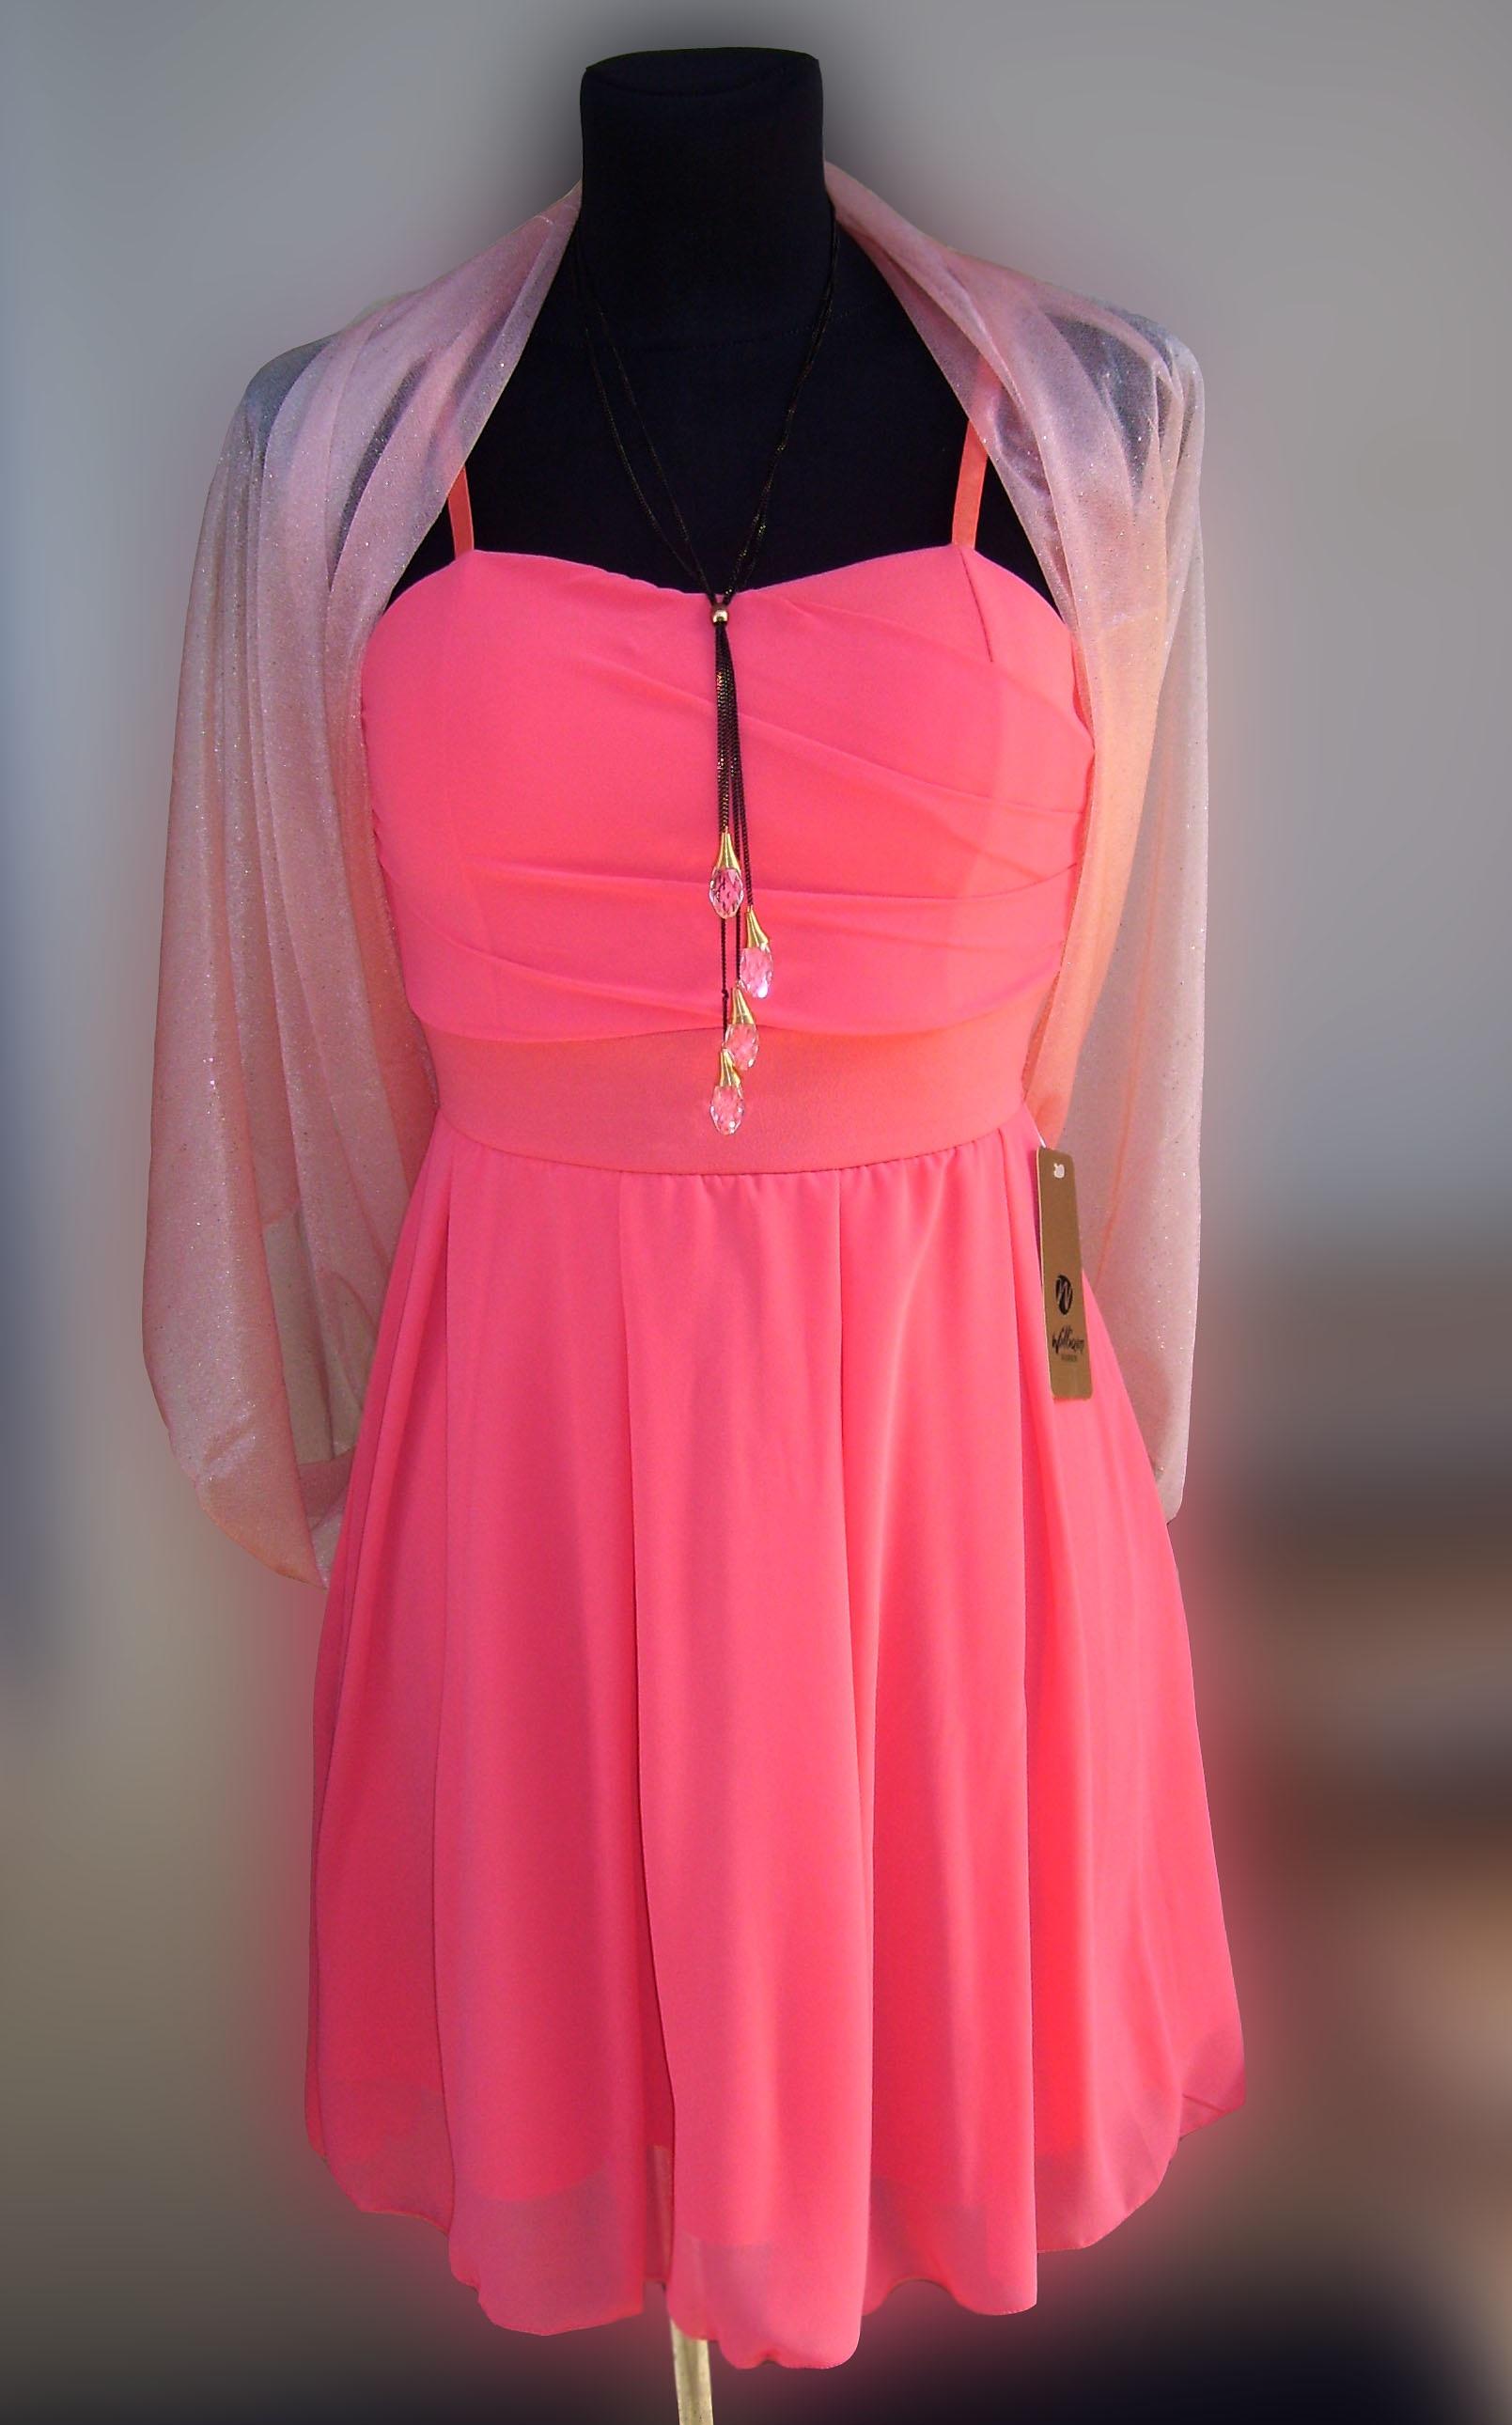 Fotos gratis : Moda, compras, rosado, ropa de calle, collar, cuerpo ...